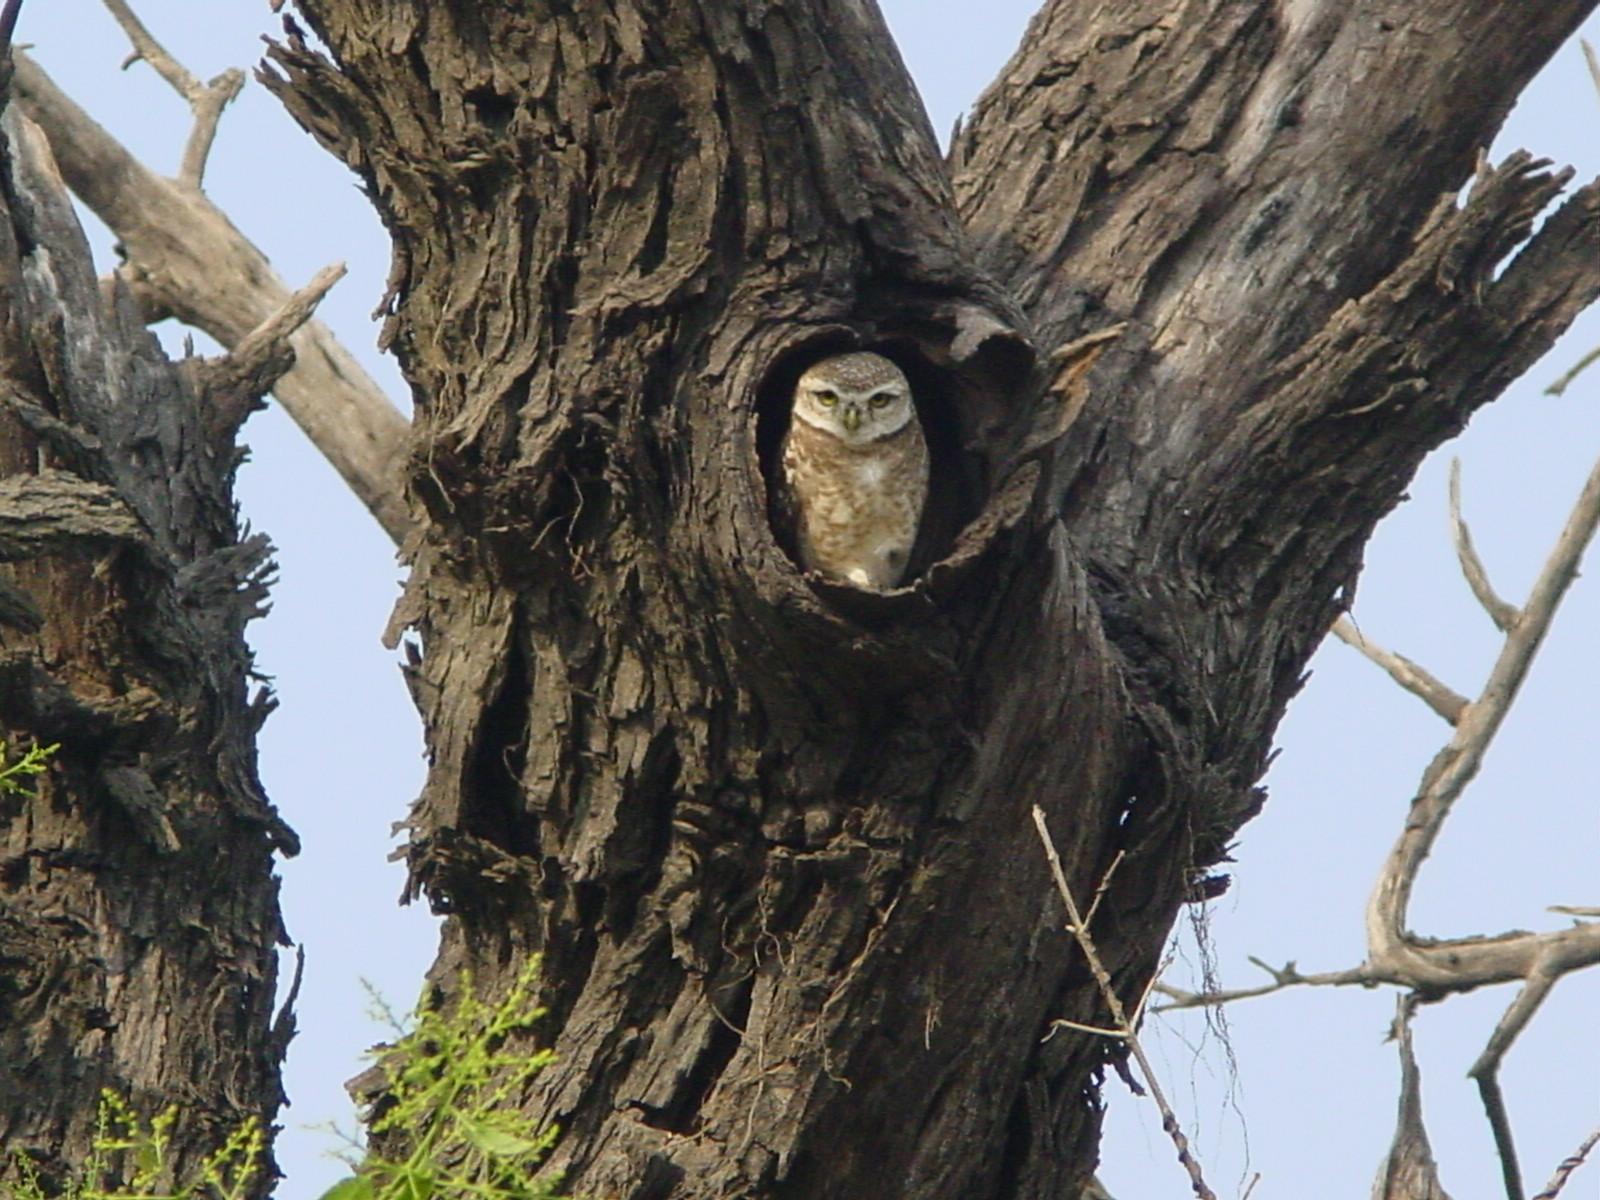 the owls plexus marcot